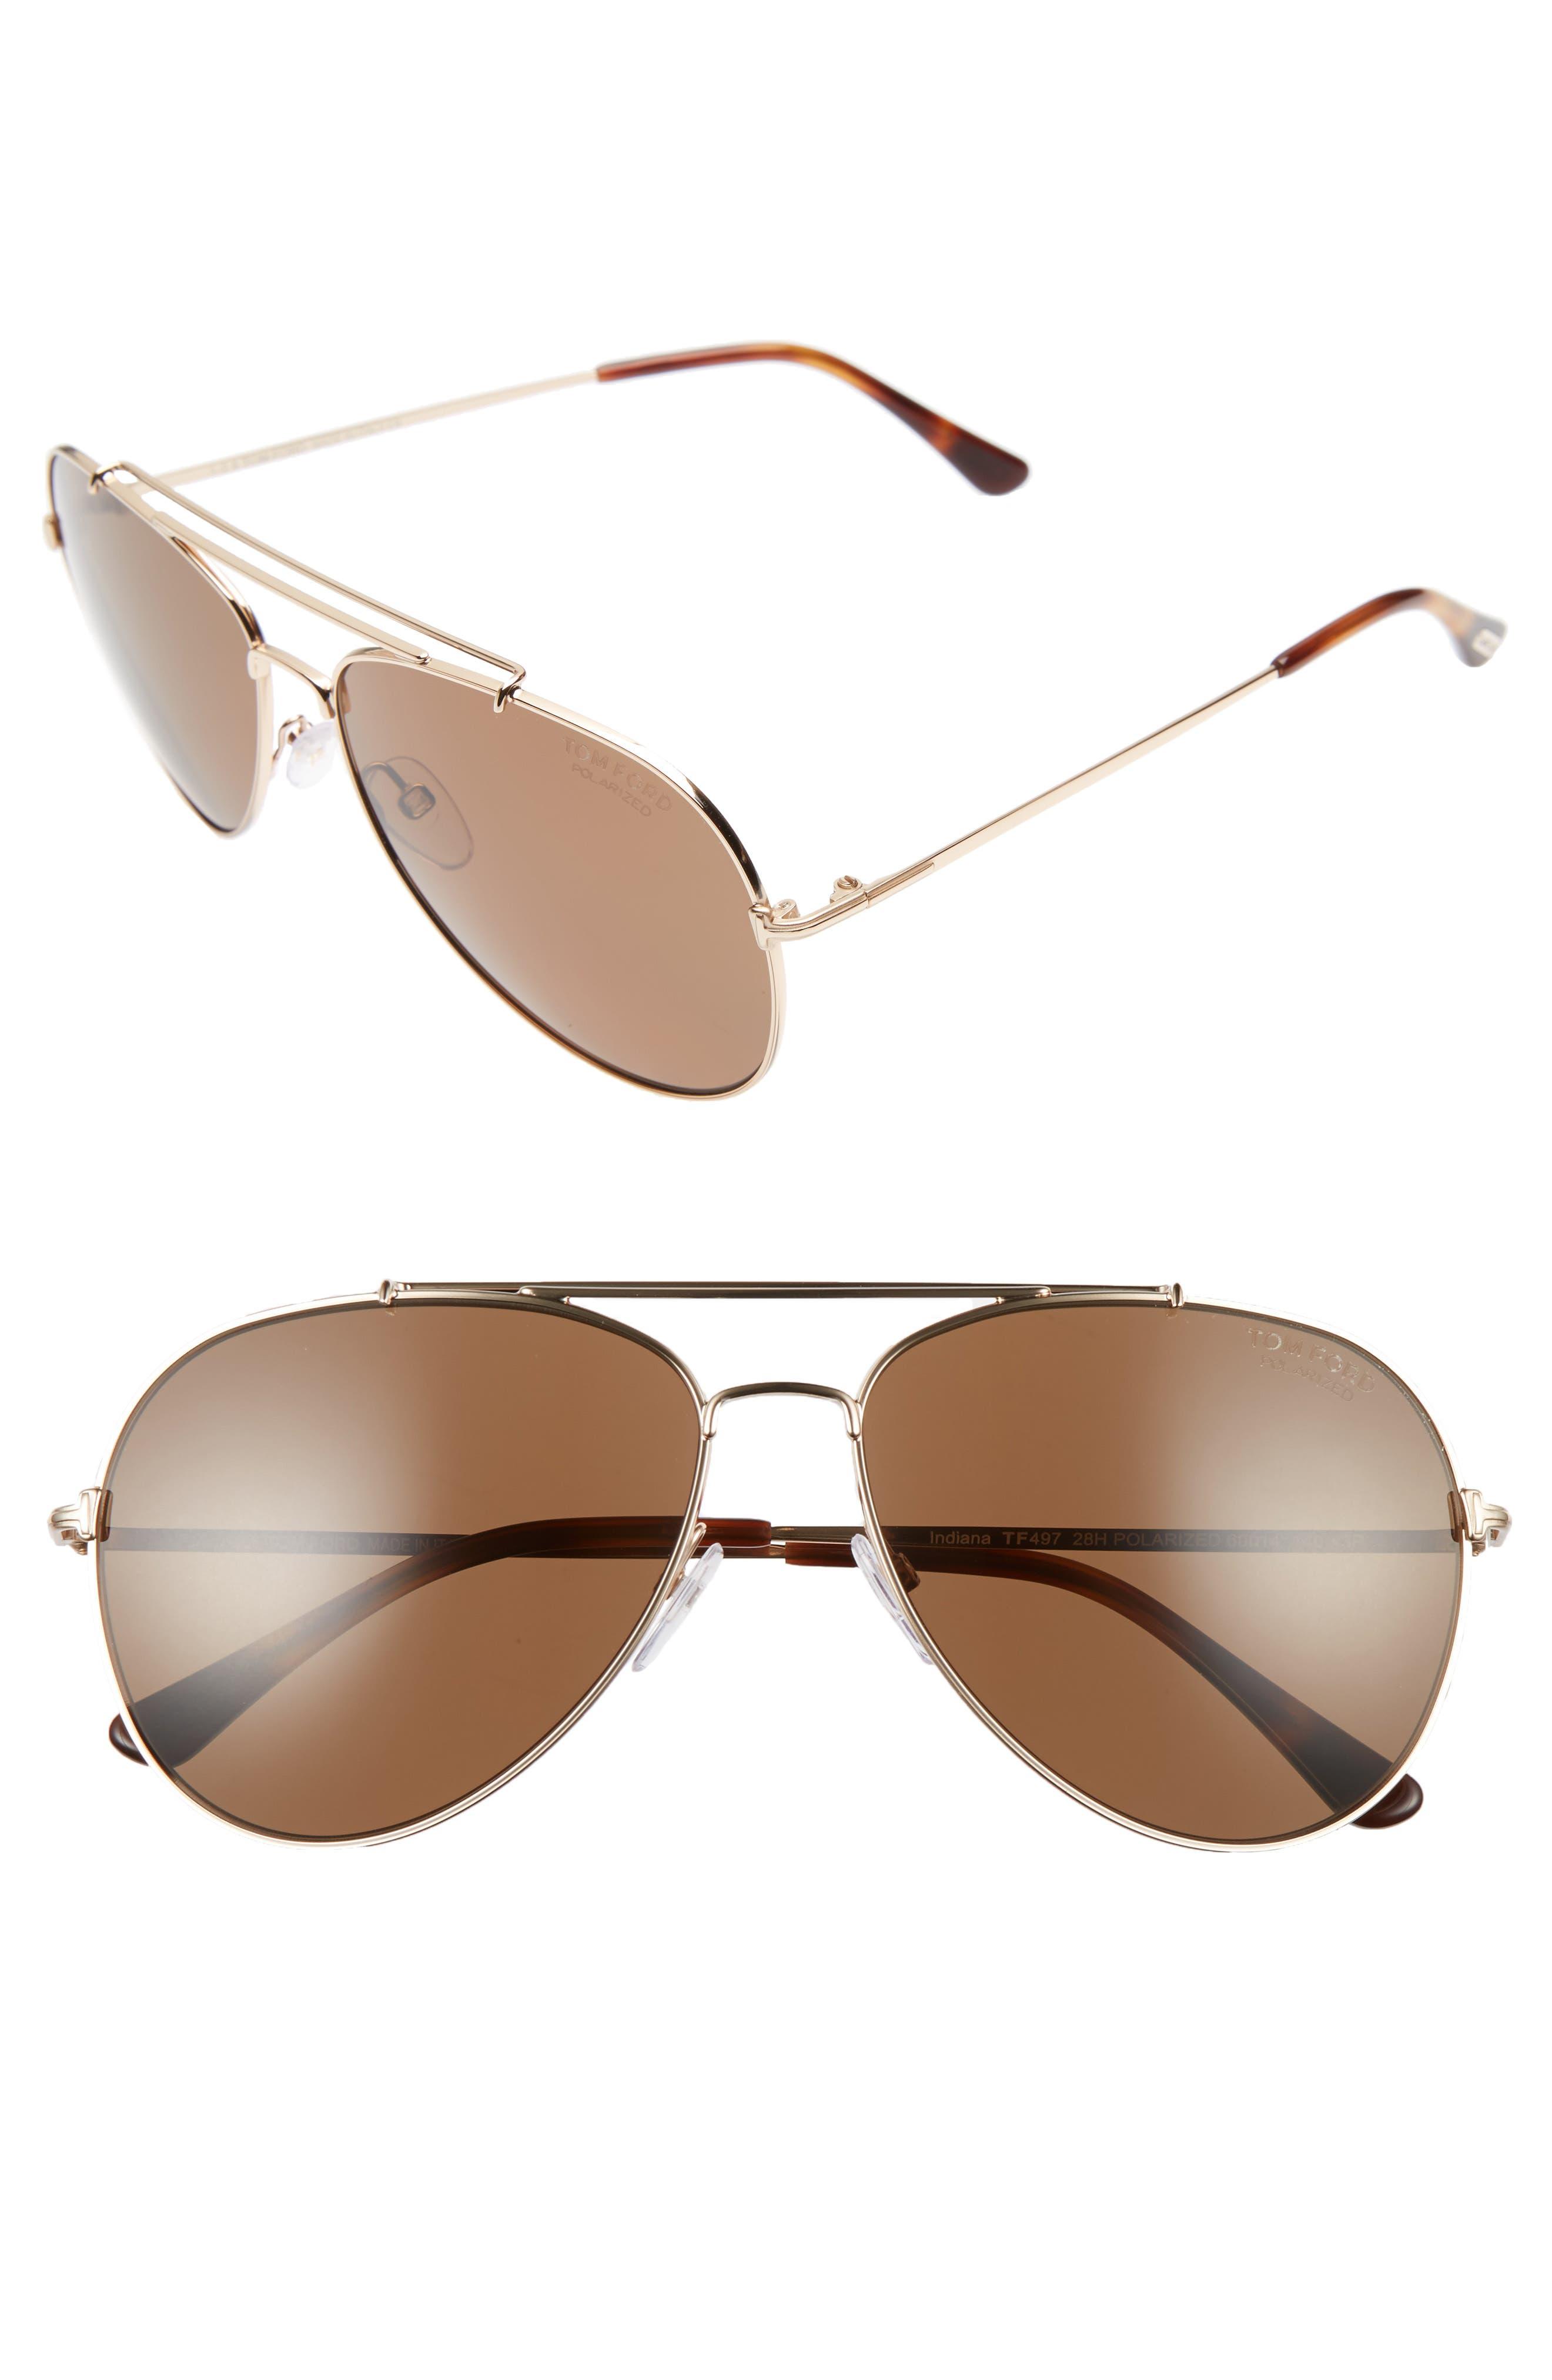 Indiana 58mm Polarized Aviator Sunglasses,                         Main,                         color, Rose Gold/ Blonde/ Brown Polar